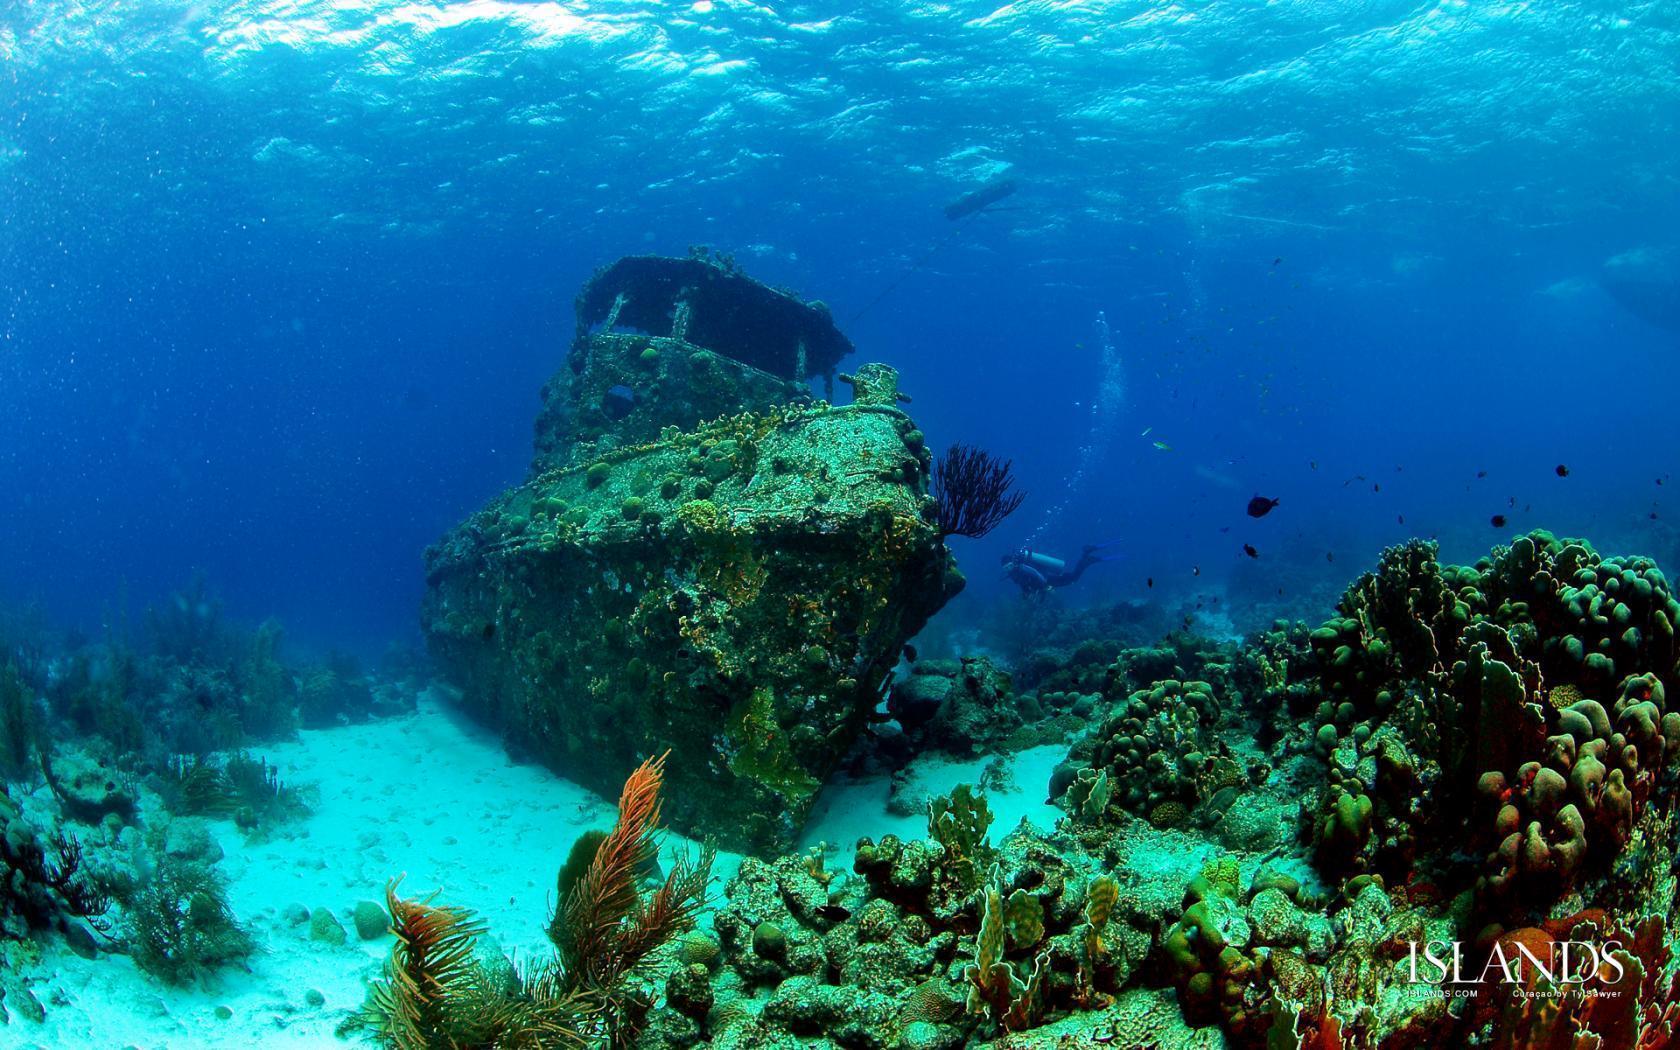 scuba diving wallpaper wallpapers - photo #13